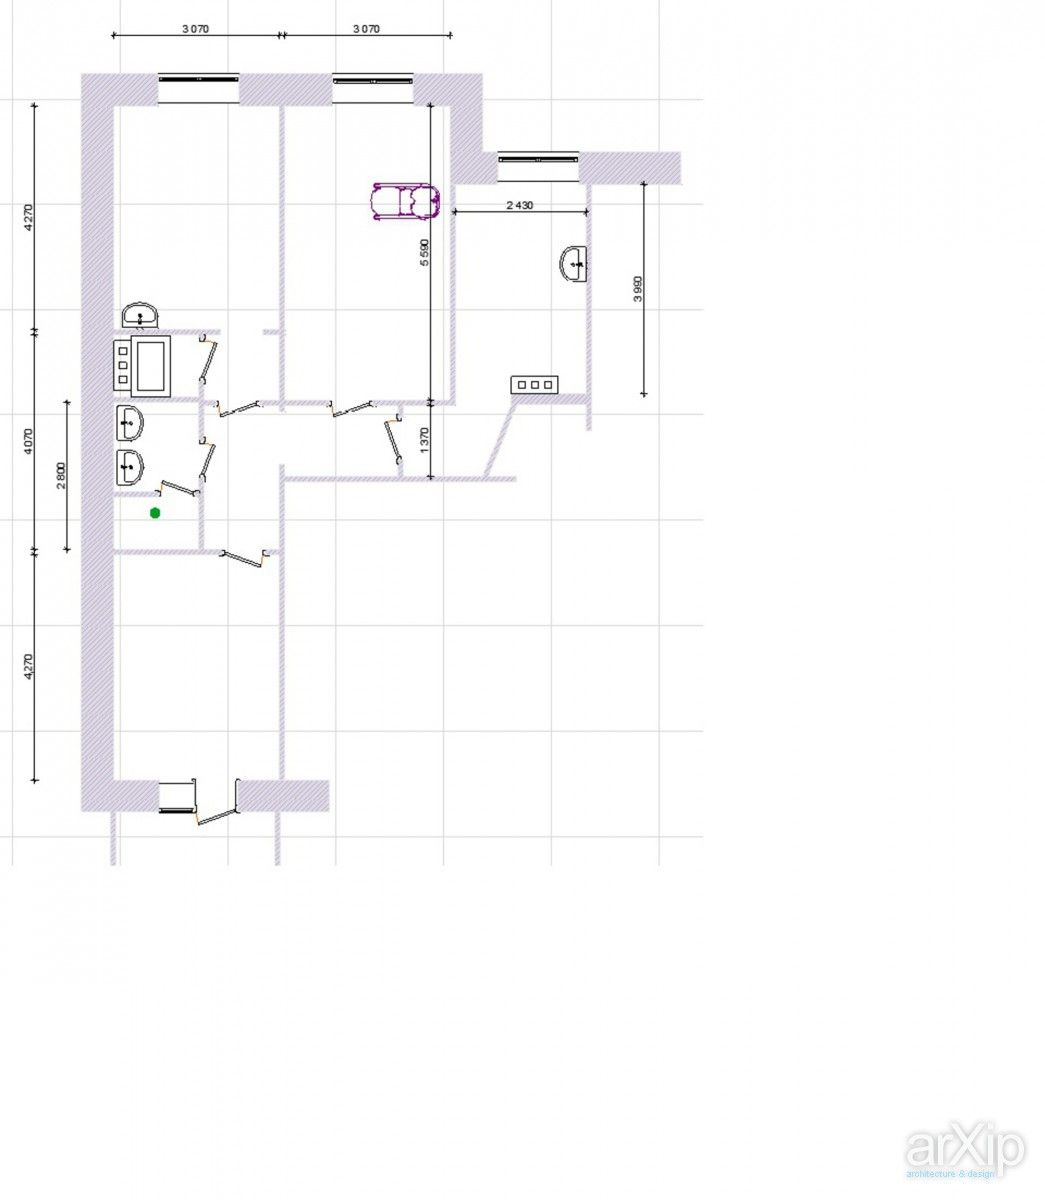 салон красоты: интерьер, зd визуализация #interiordesign #3dvisualization arXip.com